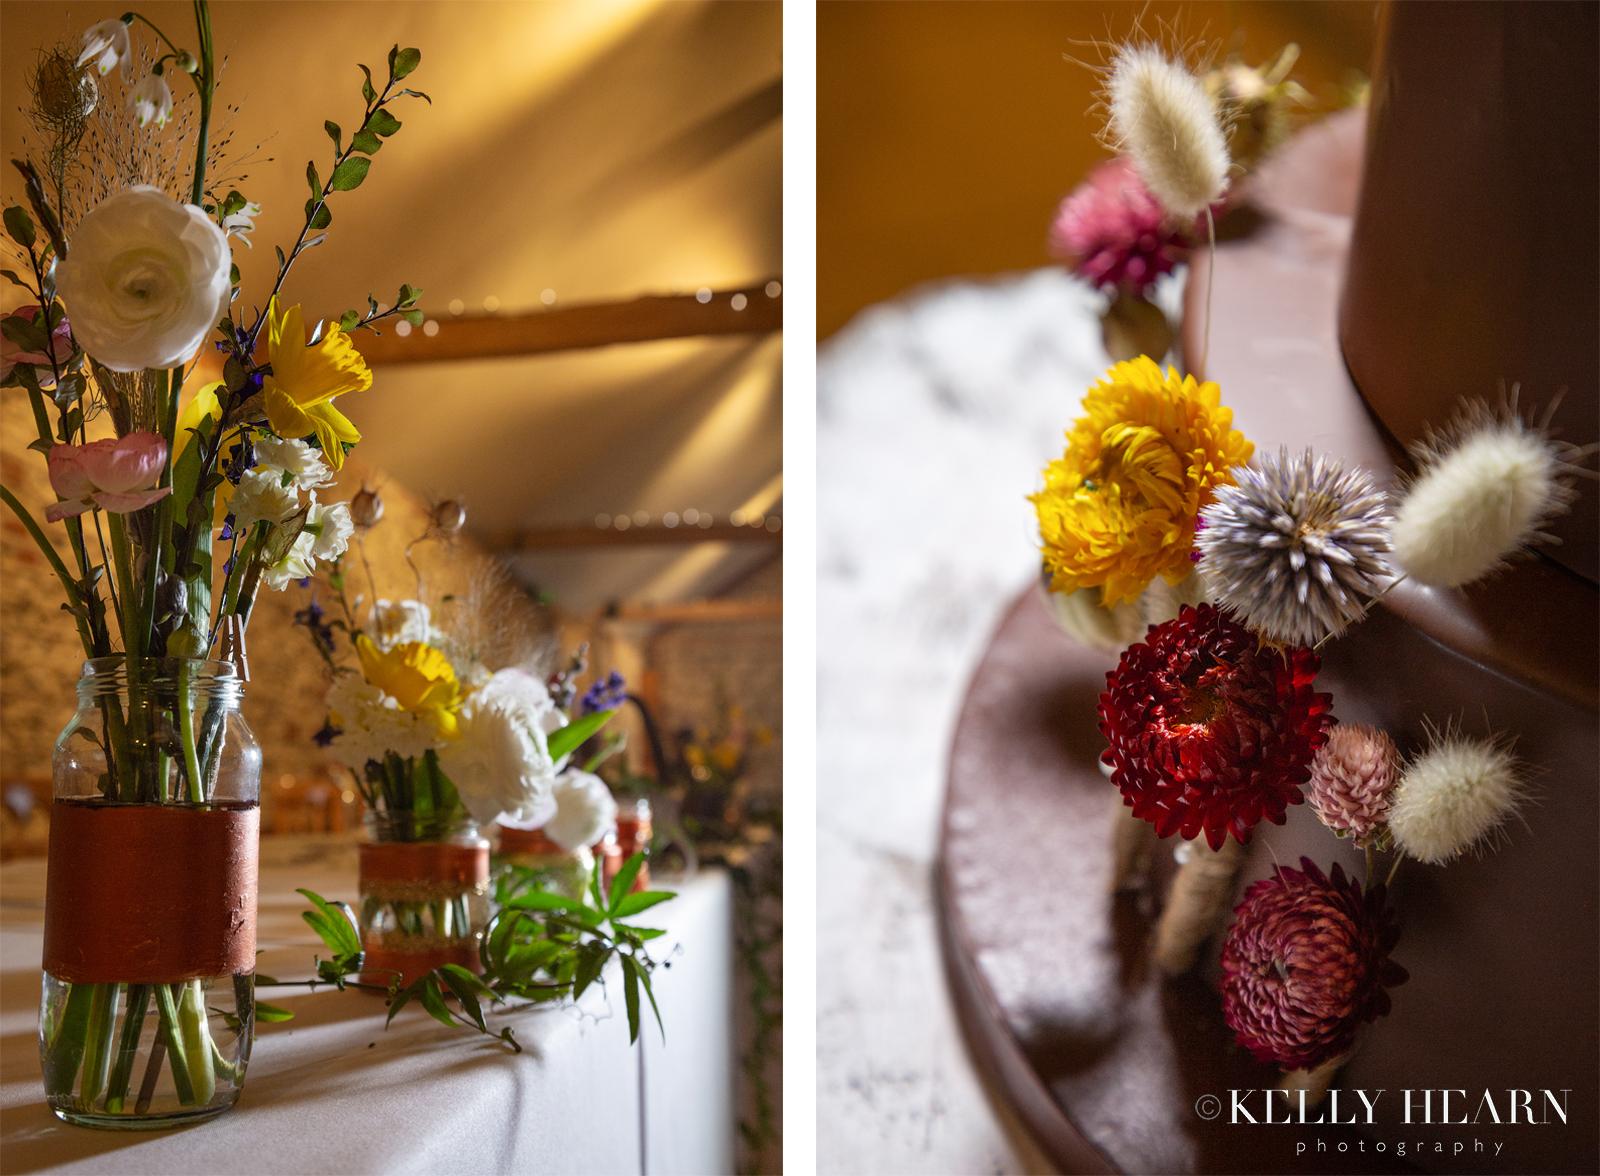 RAI_flowers-cake-details-montage.jpg#asset:2459